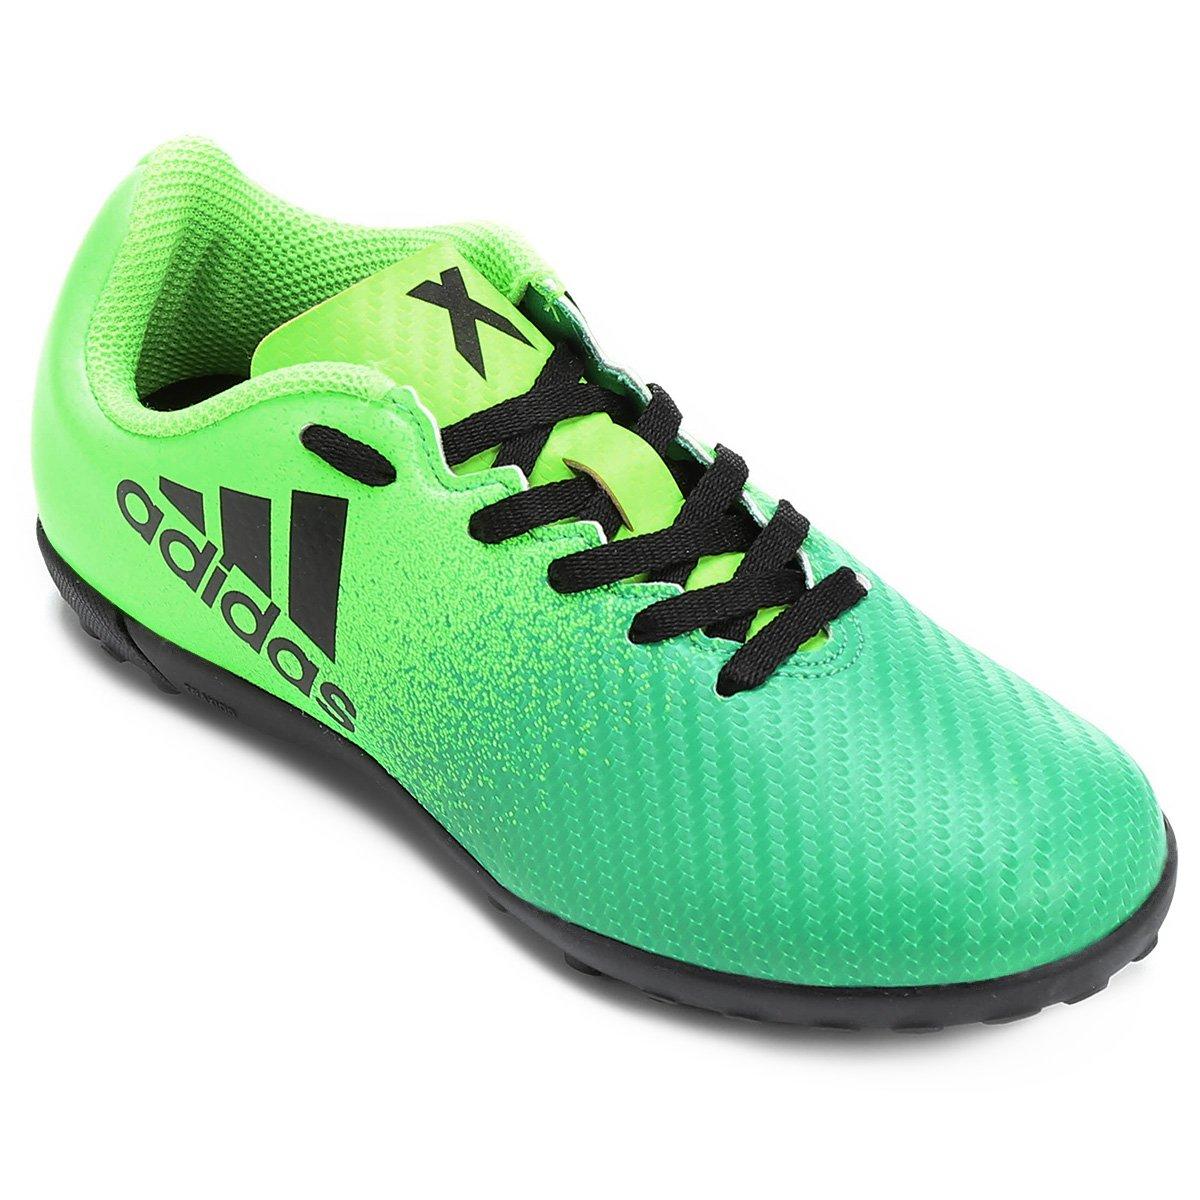 bf54784711 Chuteira Society Infantil Adidas X 16.4 TF